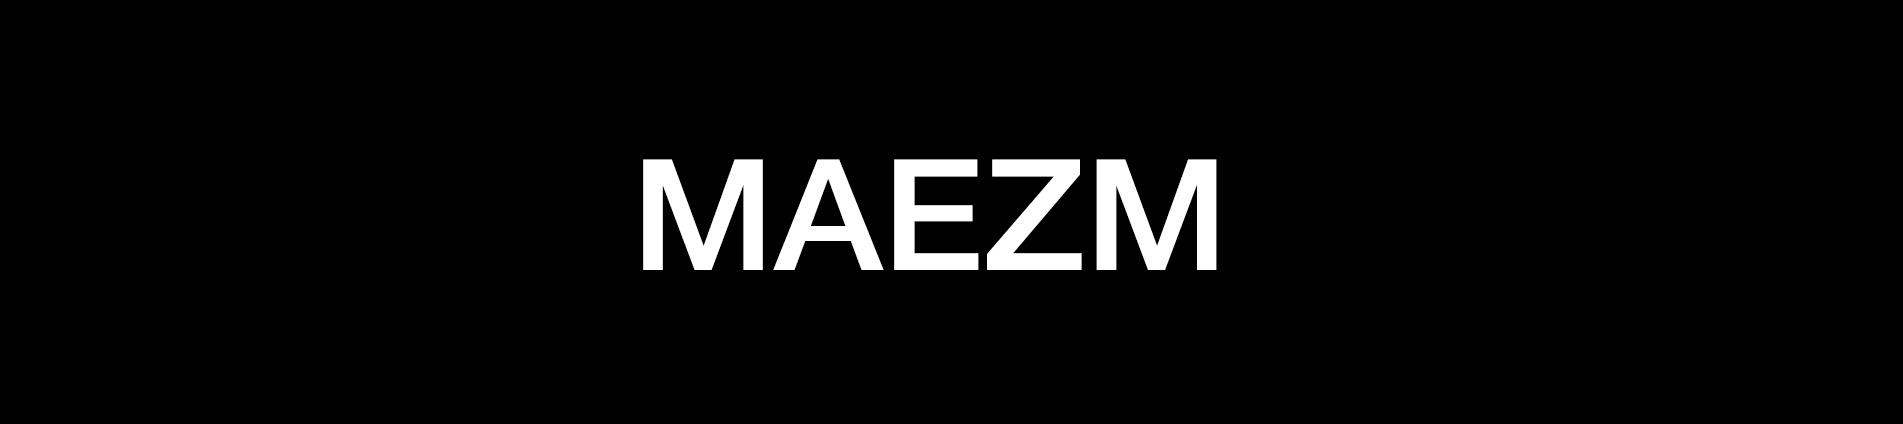 MAEZM